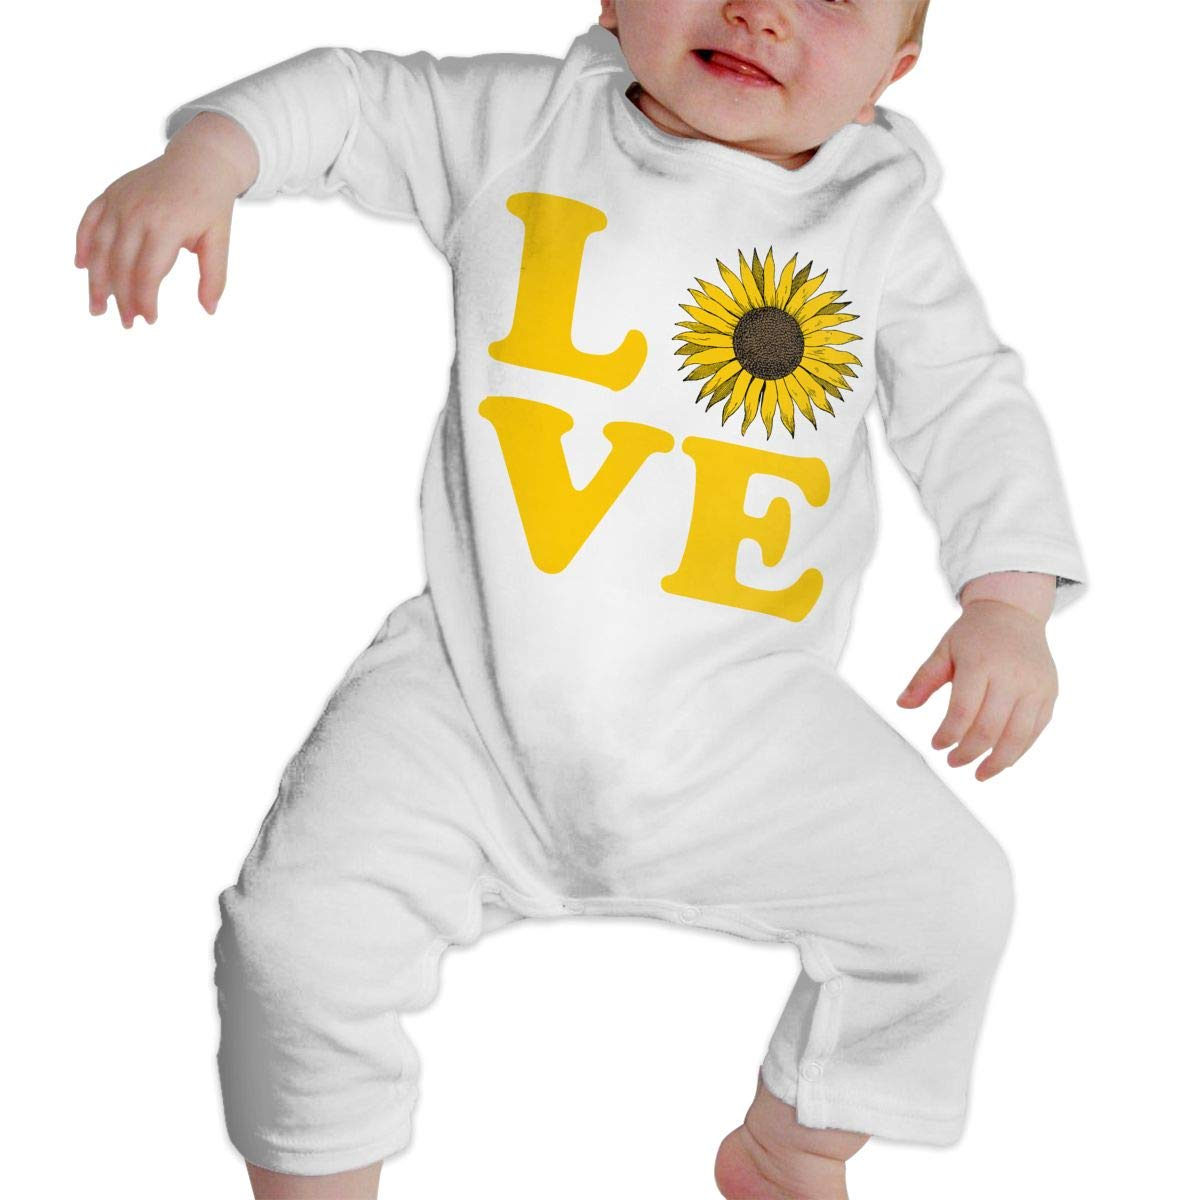 Newborn Kids Long Sleeved Coveralls Love Sunflower Toddler Jumpsuit